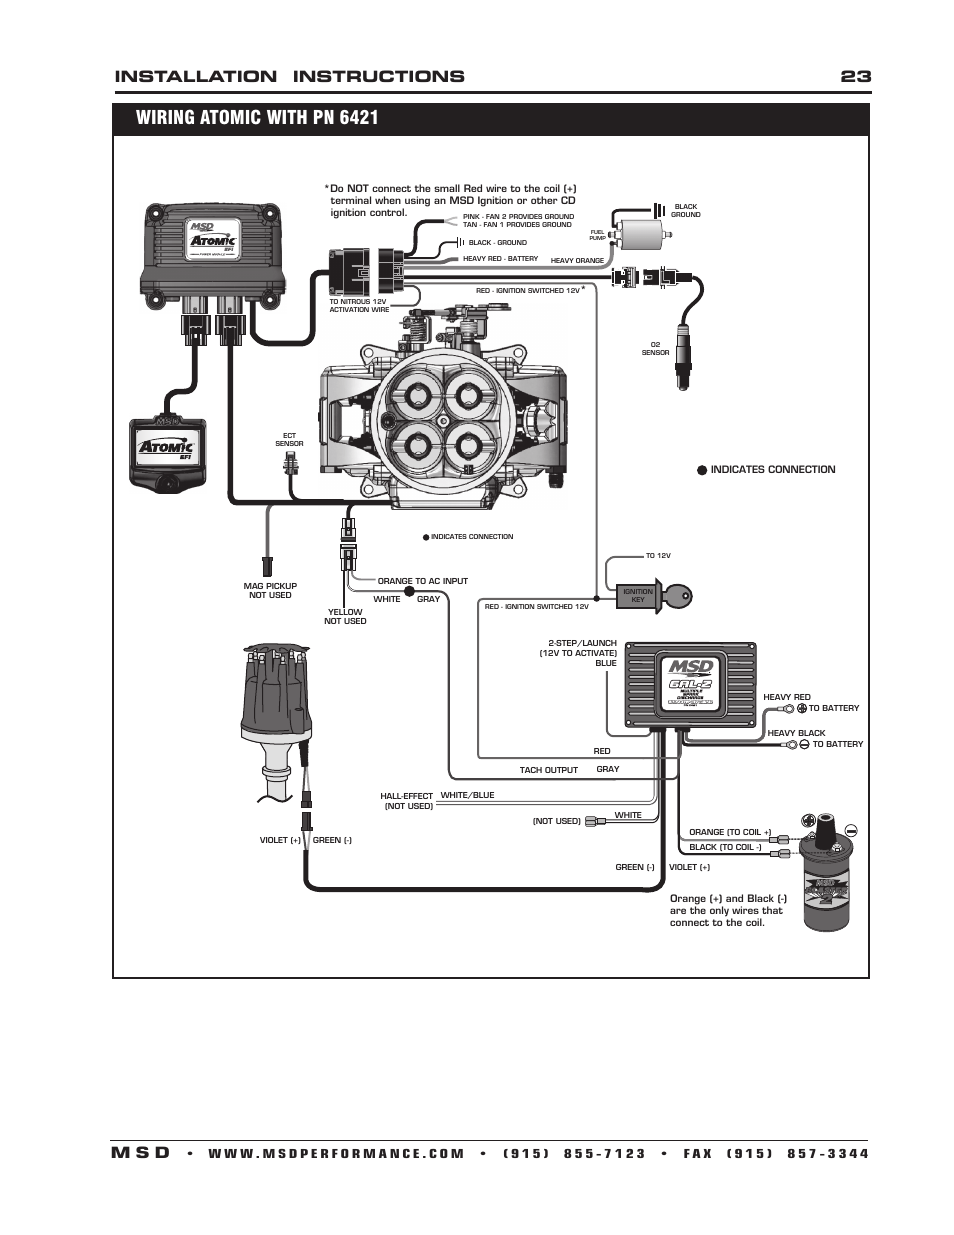 www wiring instructions com 2